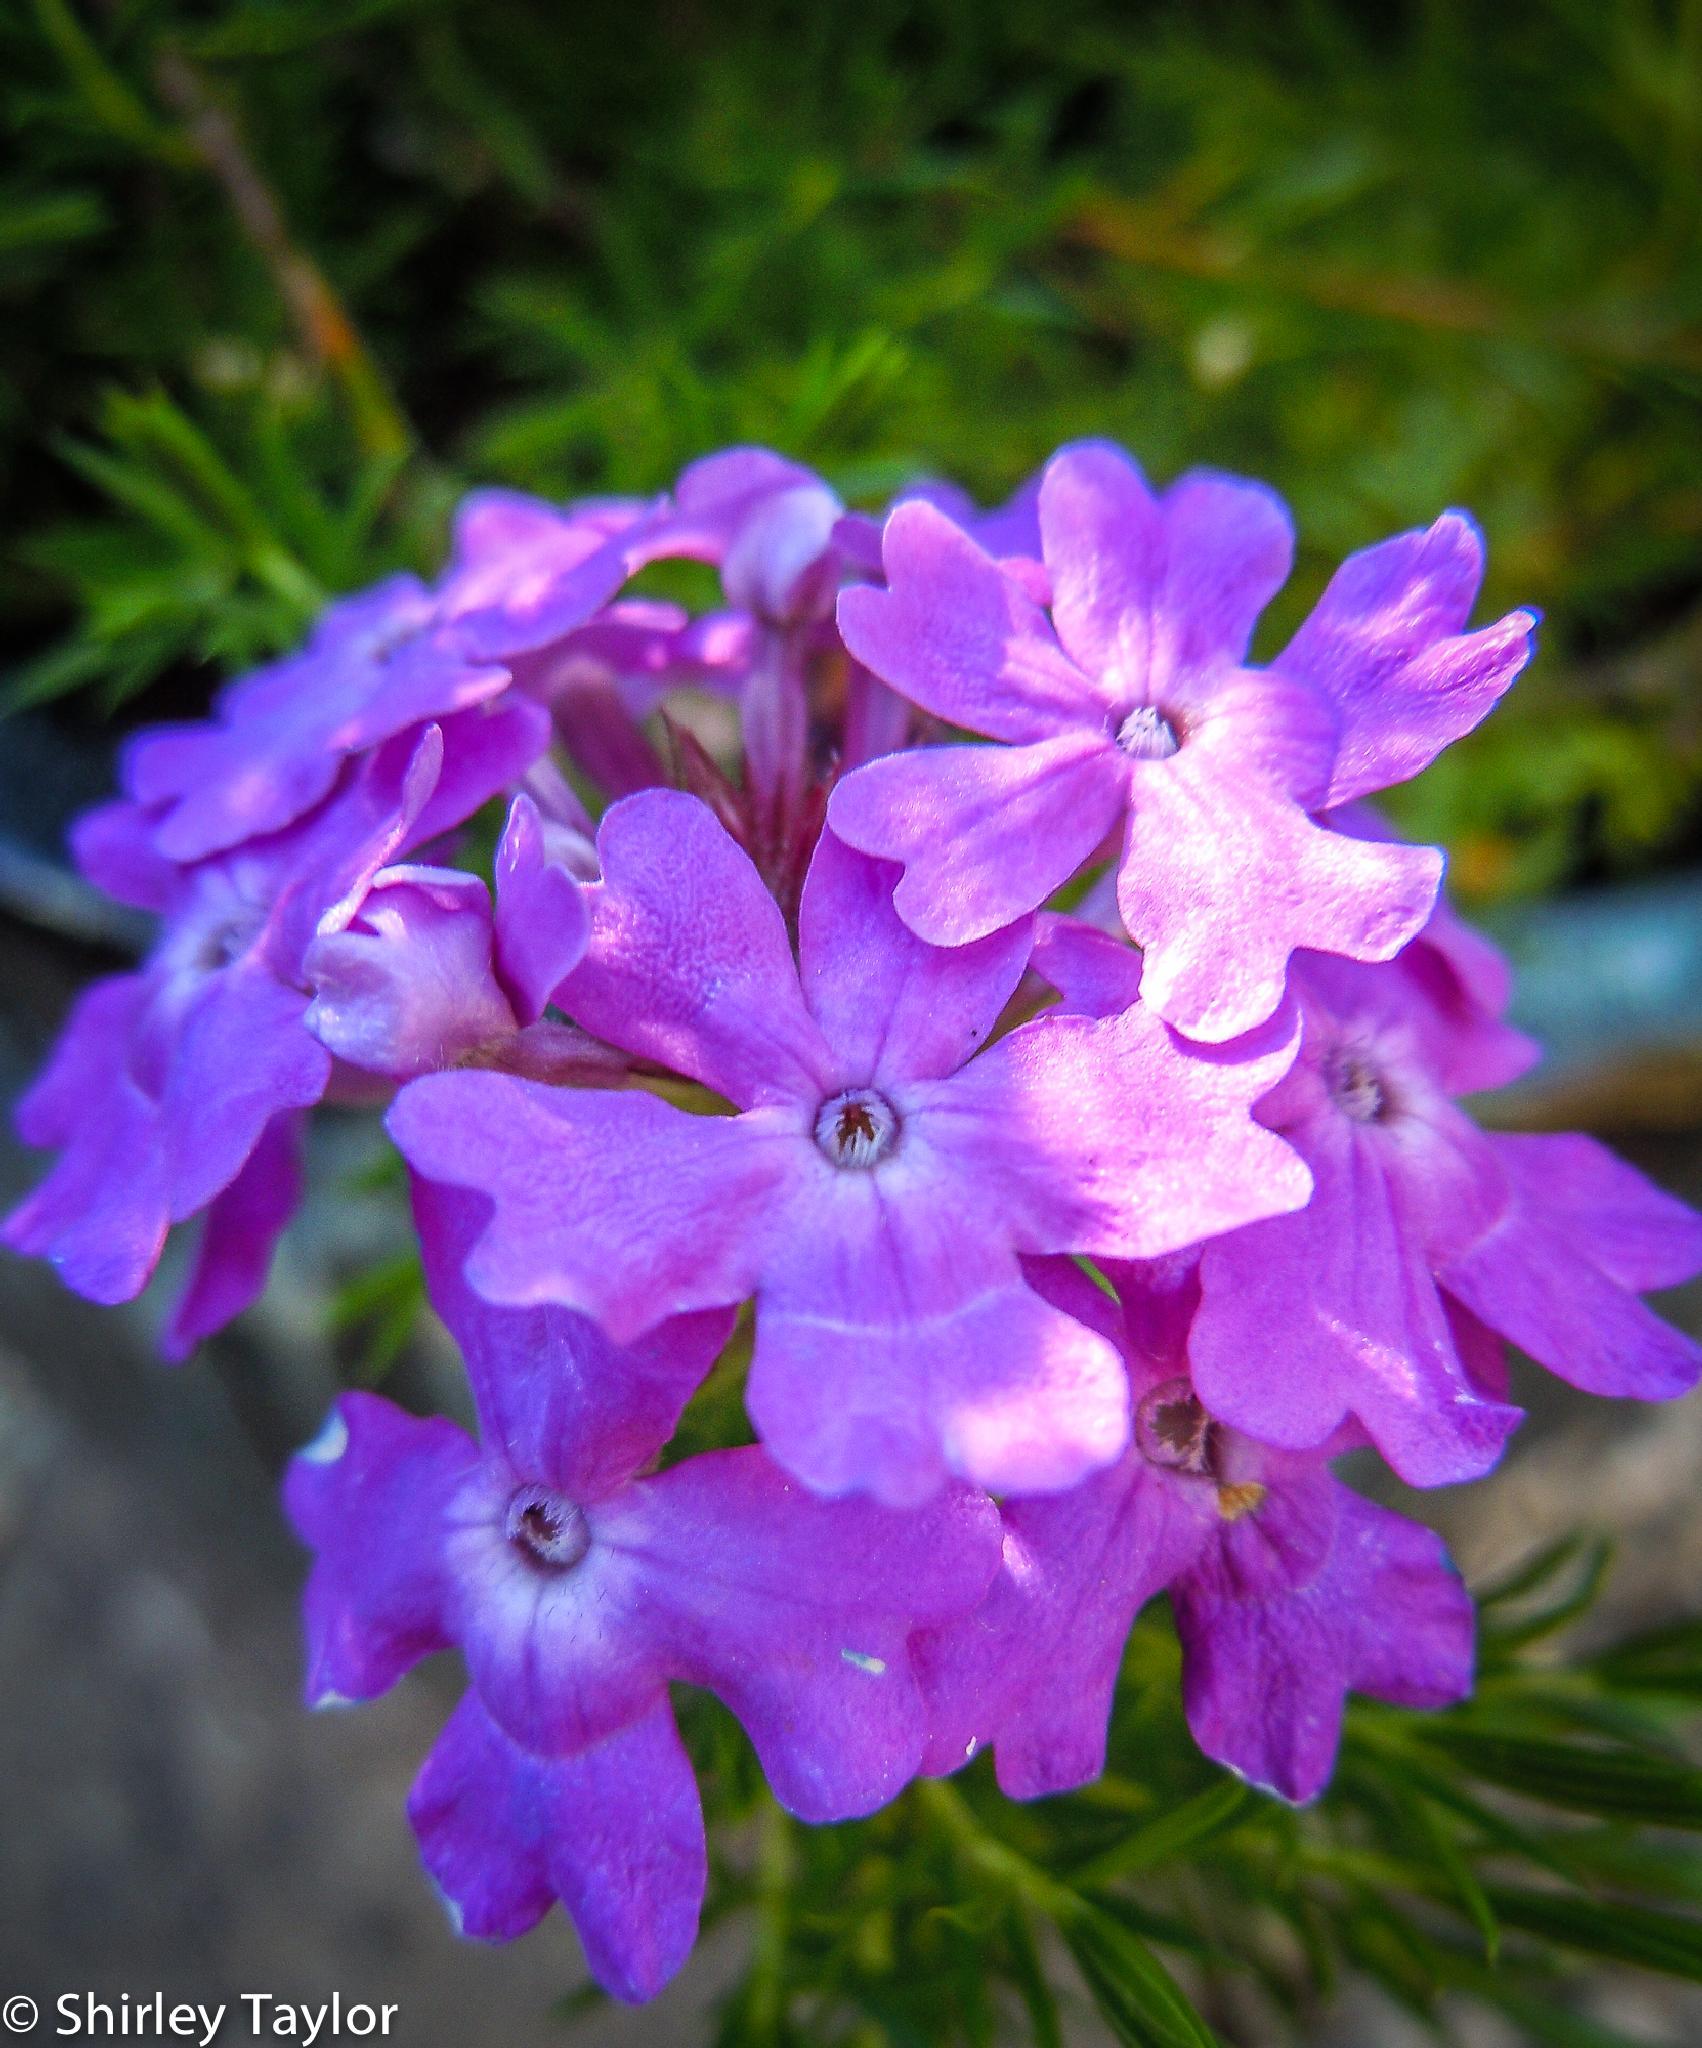 Flower by ShirleyTaylor